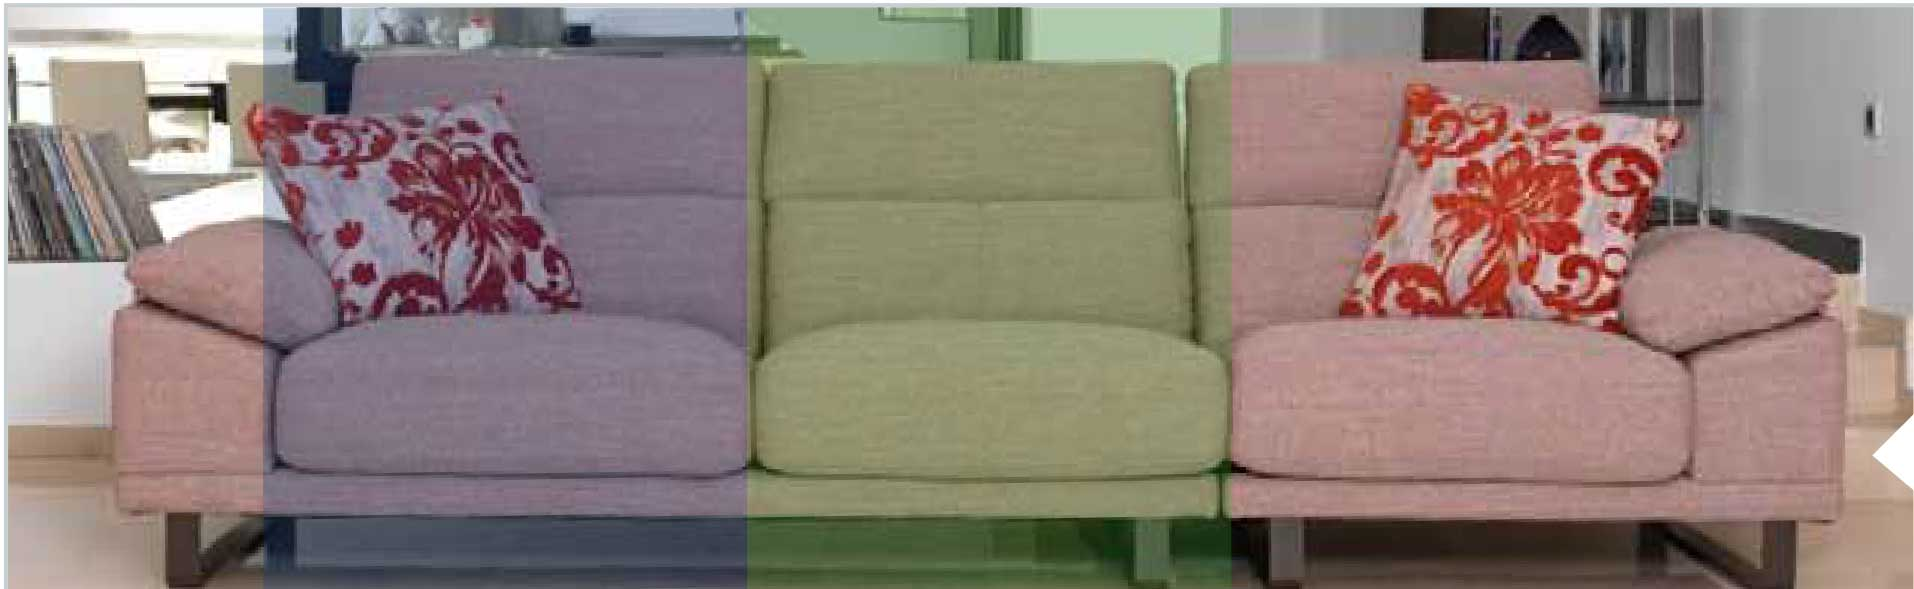 comprar sofá, tapizados de sofá